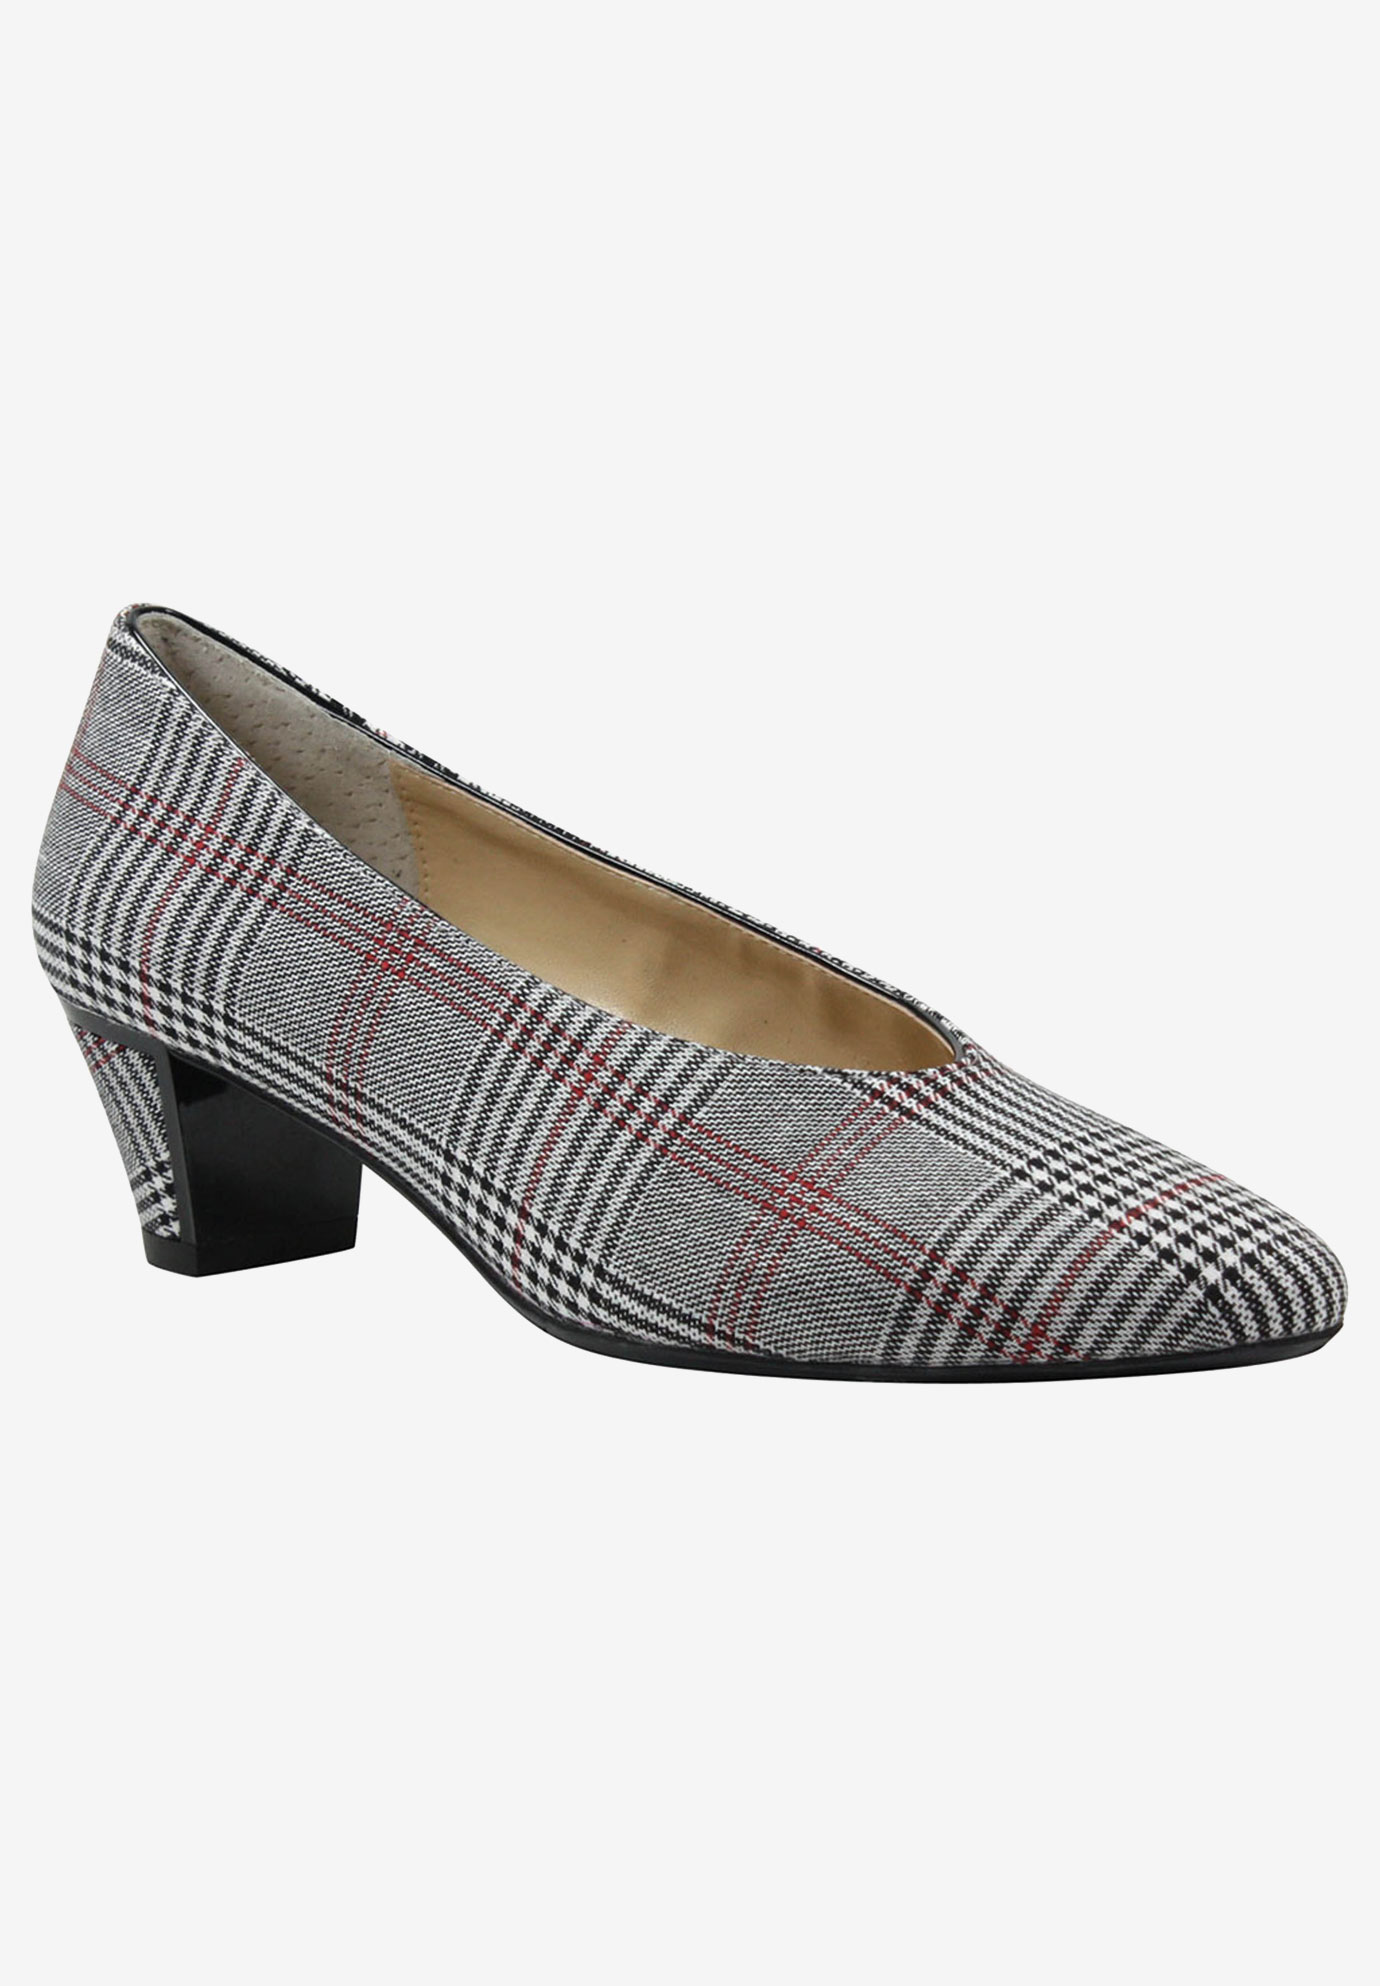 30b2c9d4a02 Clarion Pump by J.Renee®| Plus Size Dress Shoes | Full Beauty